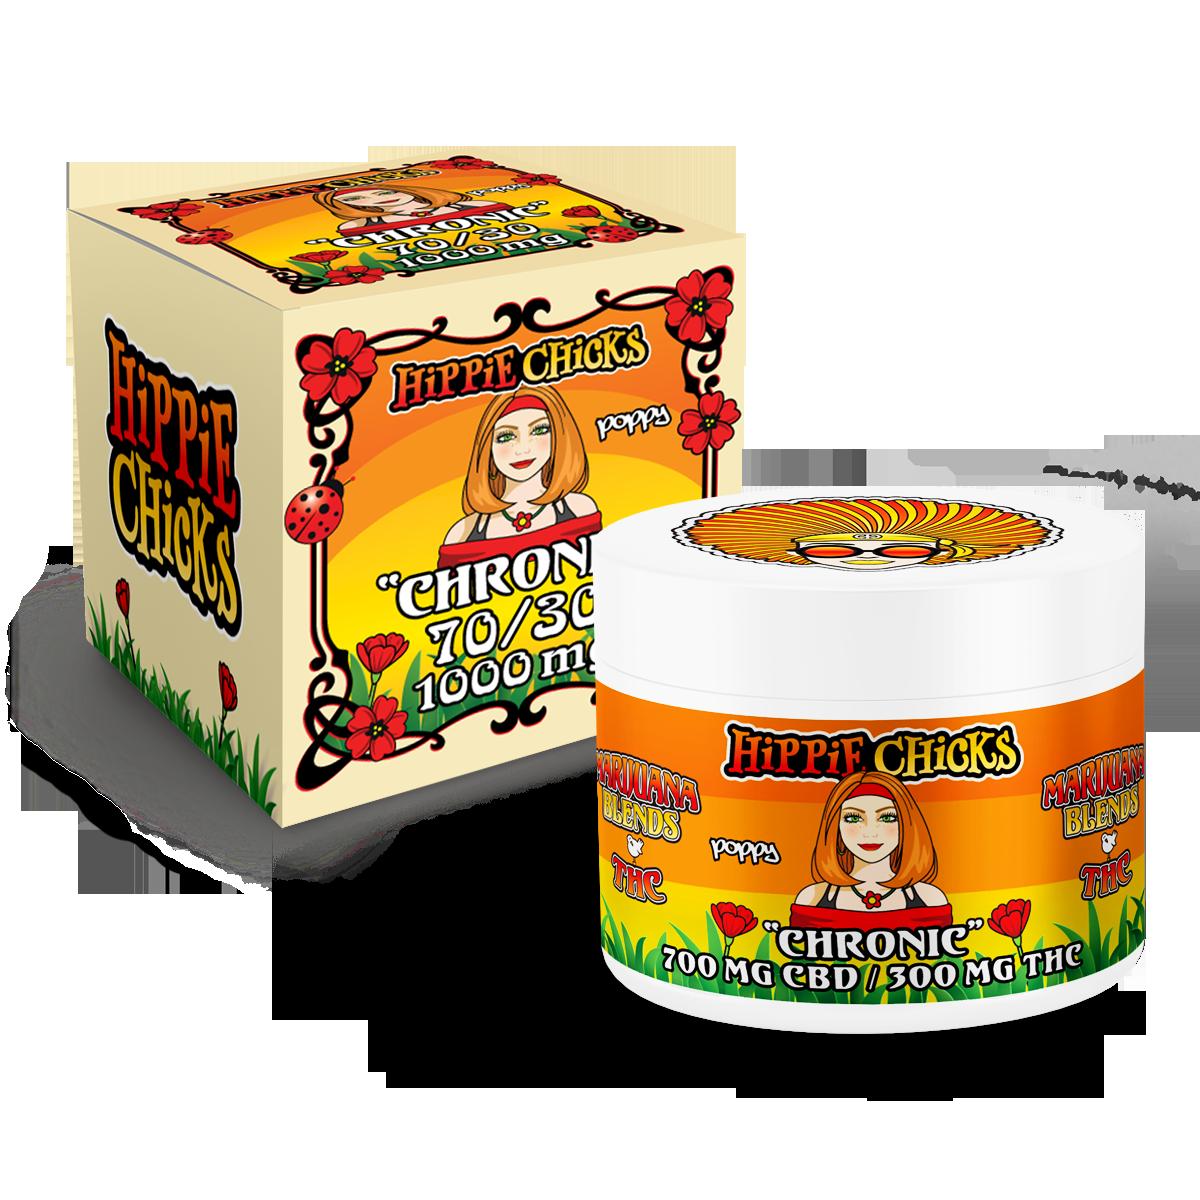 hippie-chicks-pain-relief-cream-1000mg--700mg-CBD-300-mg-THC full spectrum